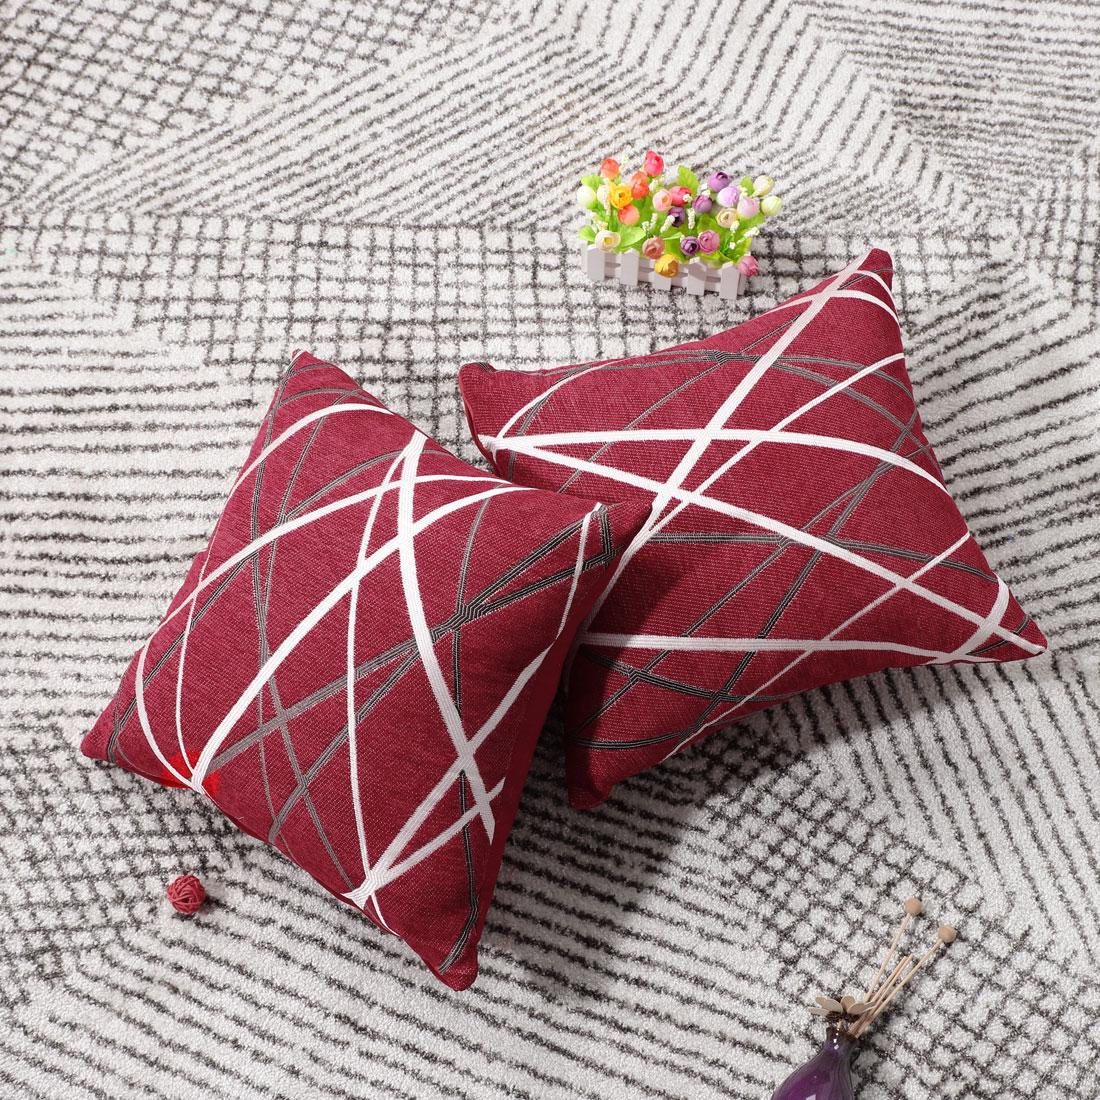 Decoration-Pillow-Covers-Cotton-Linen-Throw-Pillow-Case-Cushion-Cover thumbnail 50